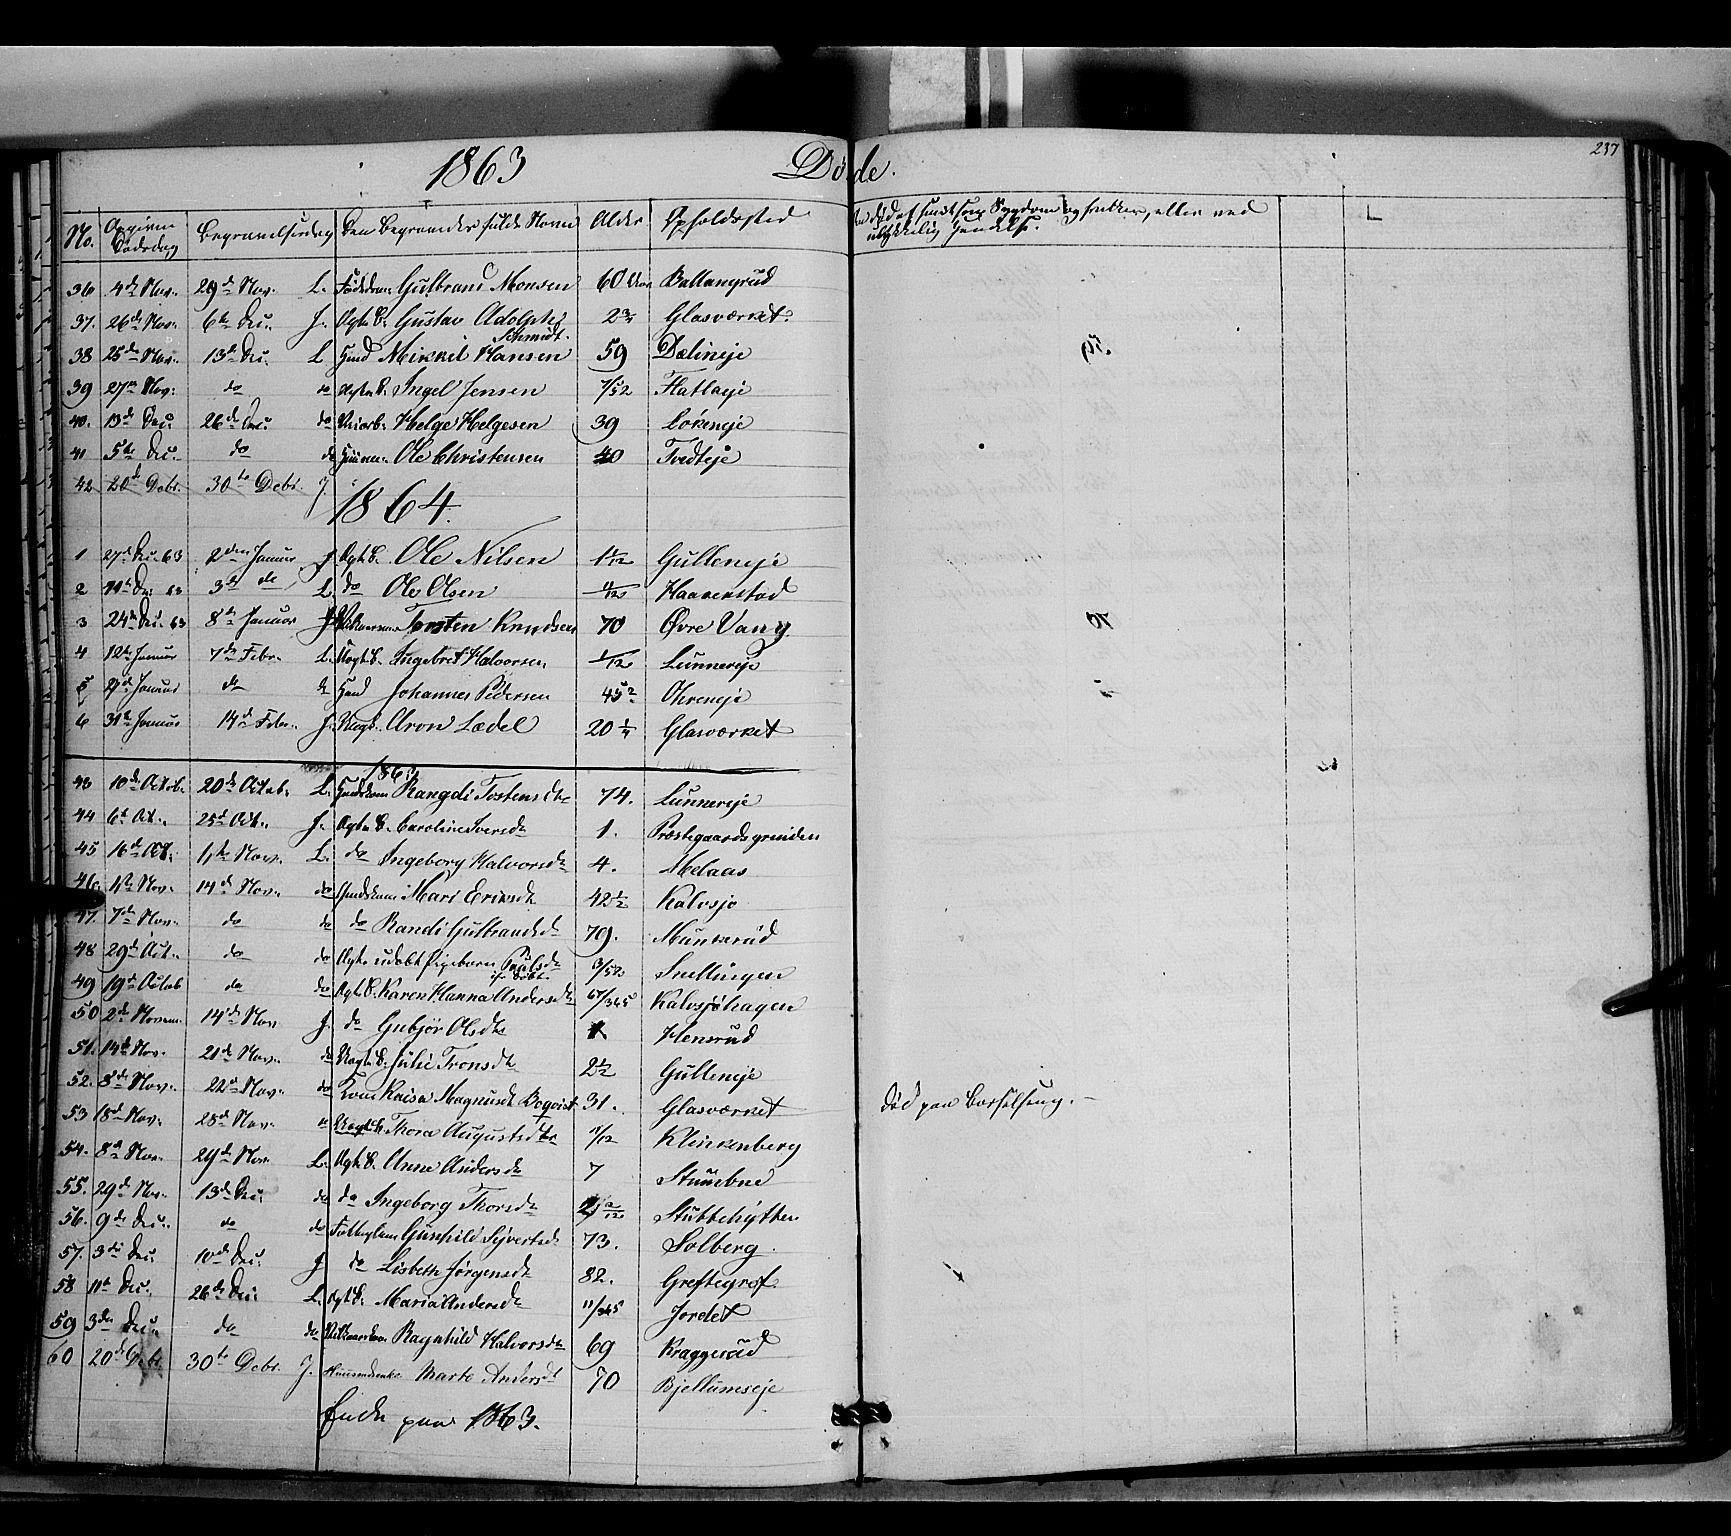 SAH, Jevnaker prestekontor, Ministerialbok nr. 7, 1858-1876, s. 237